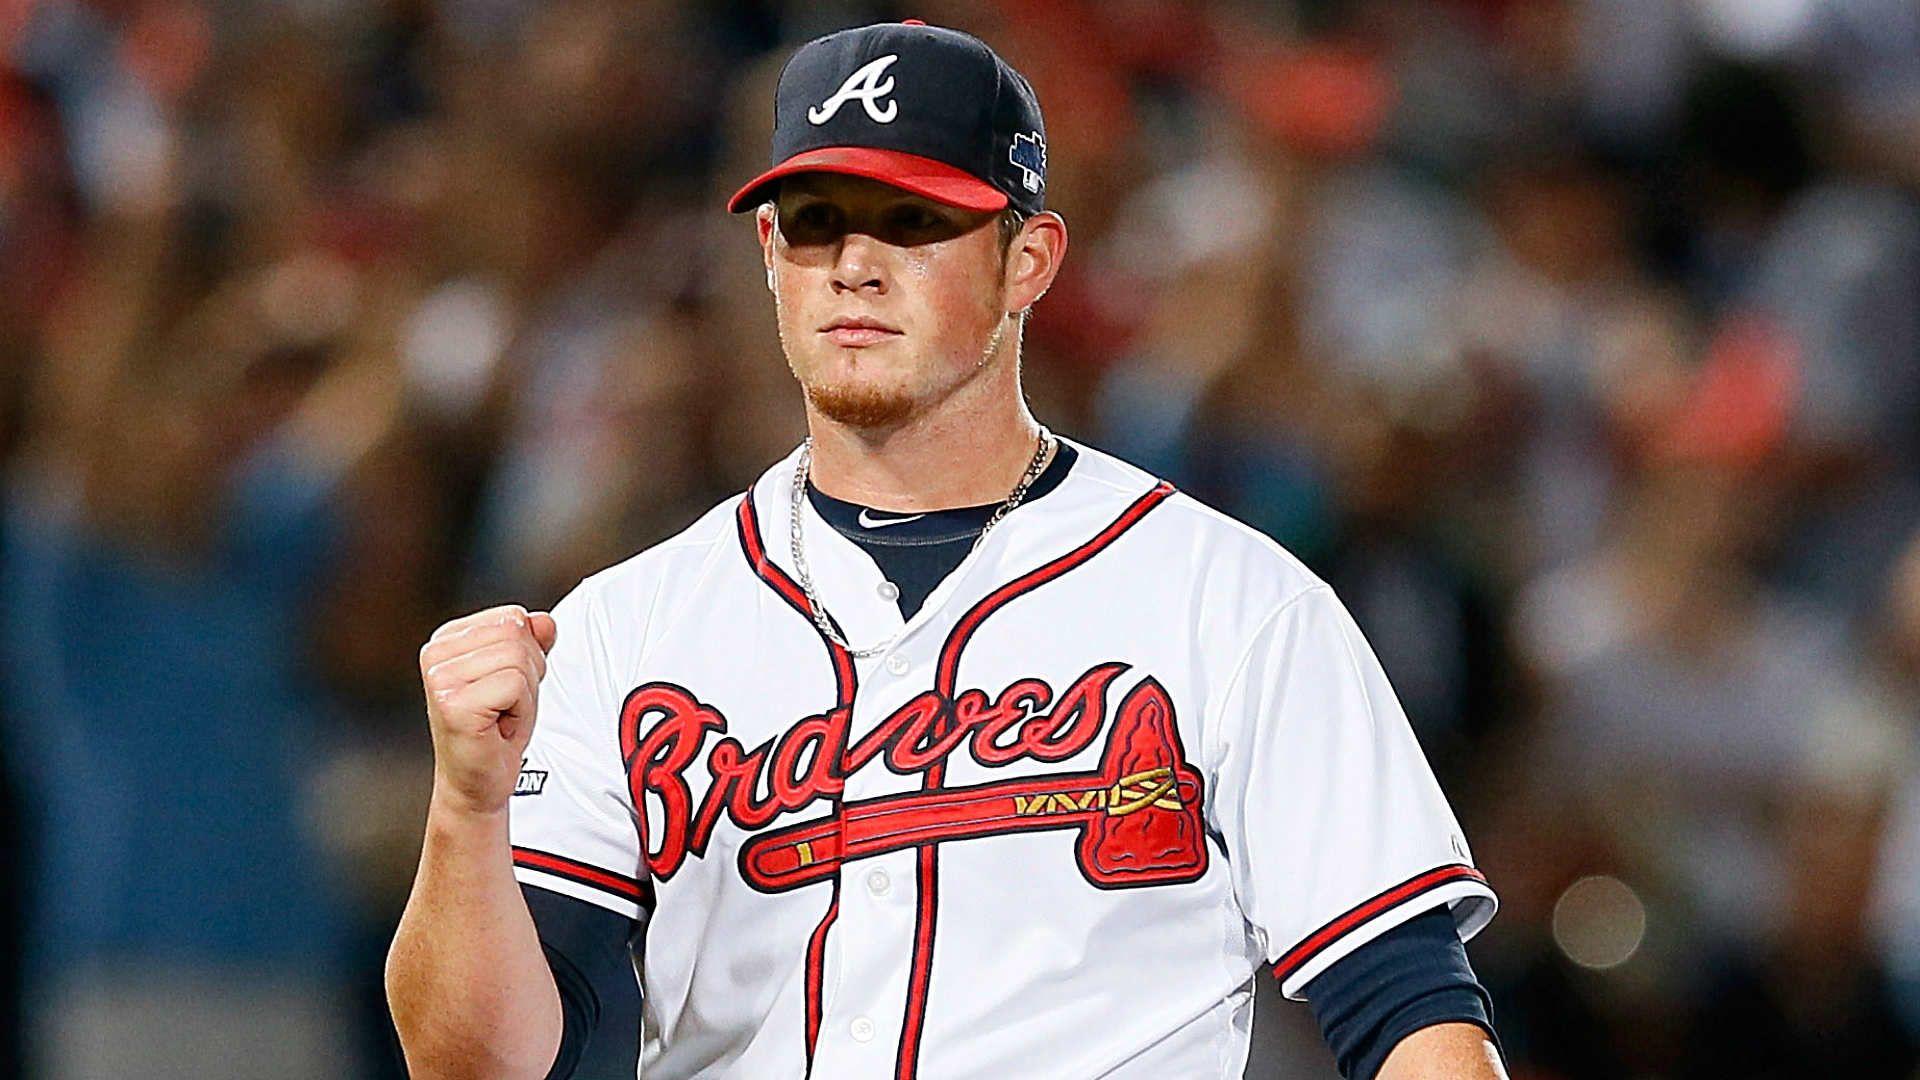 Braves Craig Kimbrel Google Search Braves Baseball Atlanta Braves Braves